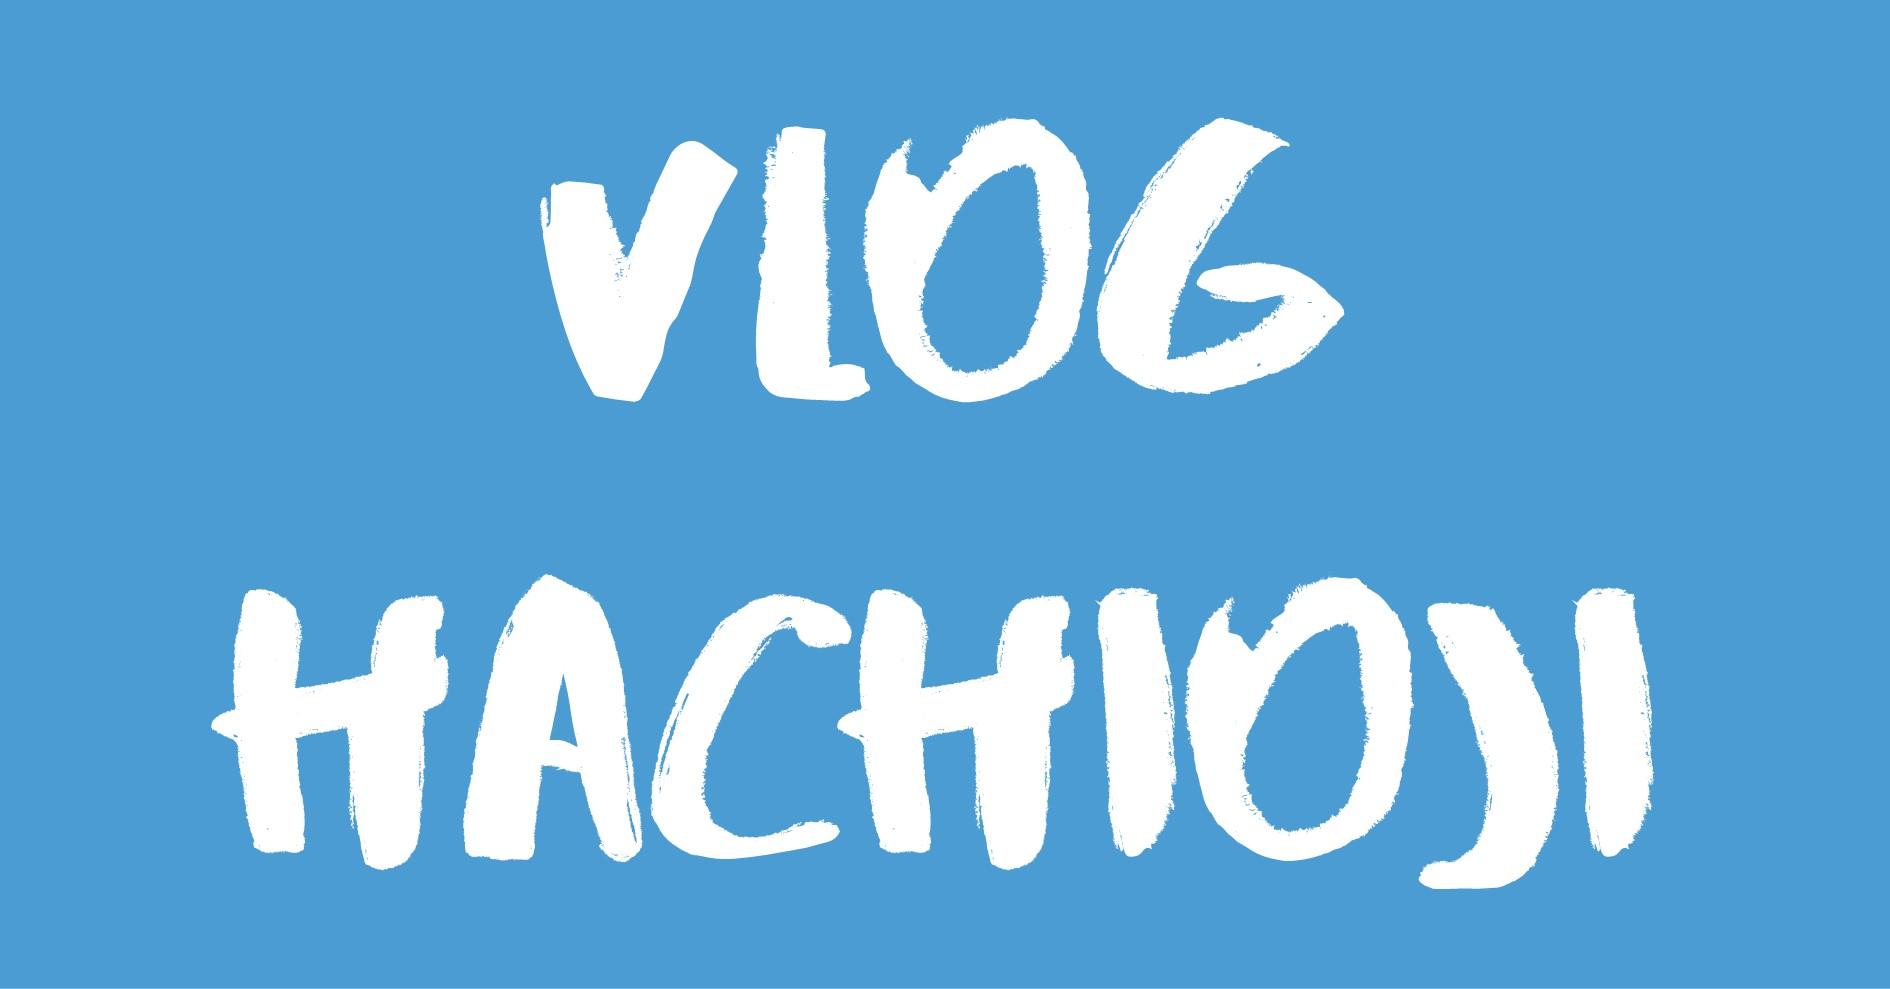 [Vlog] 八王子 / Hachioji